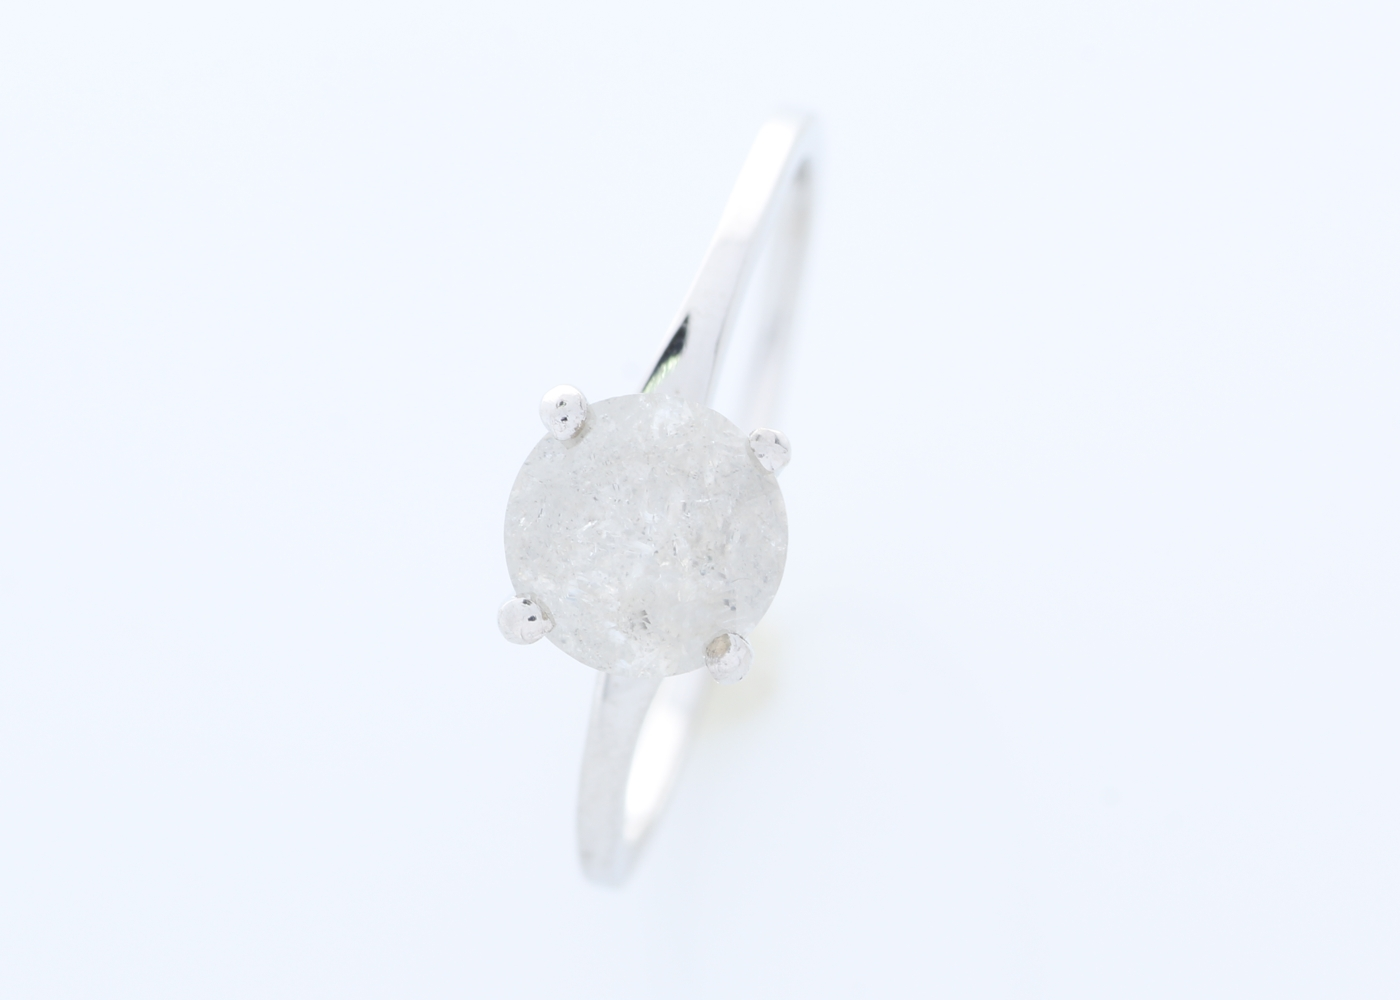 18k White Gold Wire Set Diamond Ring 1.05 Carats